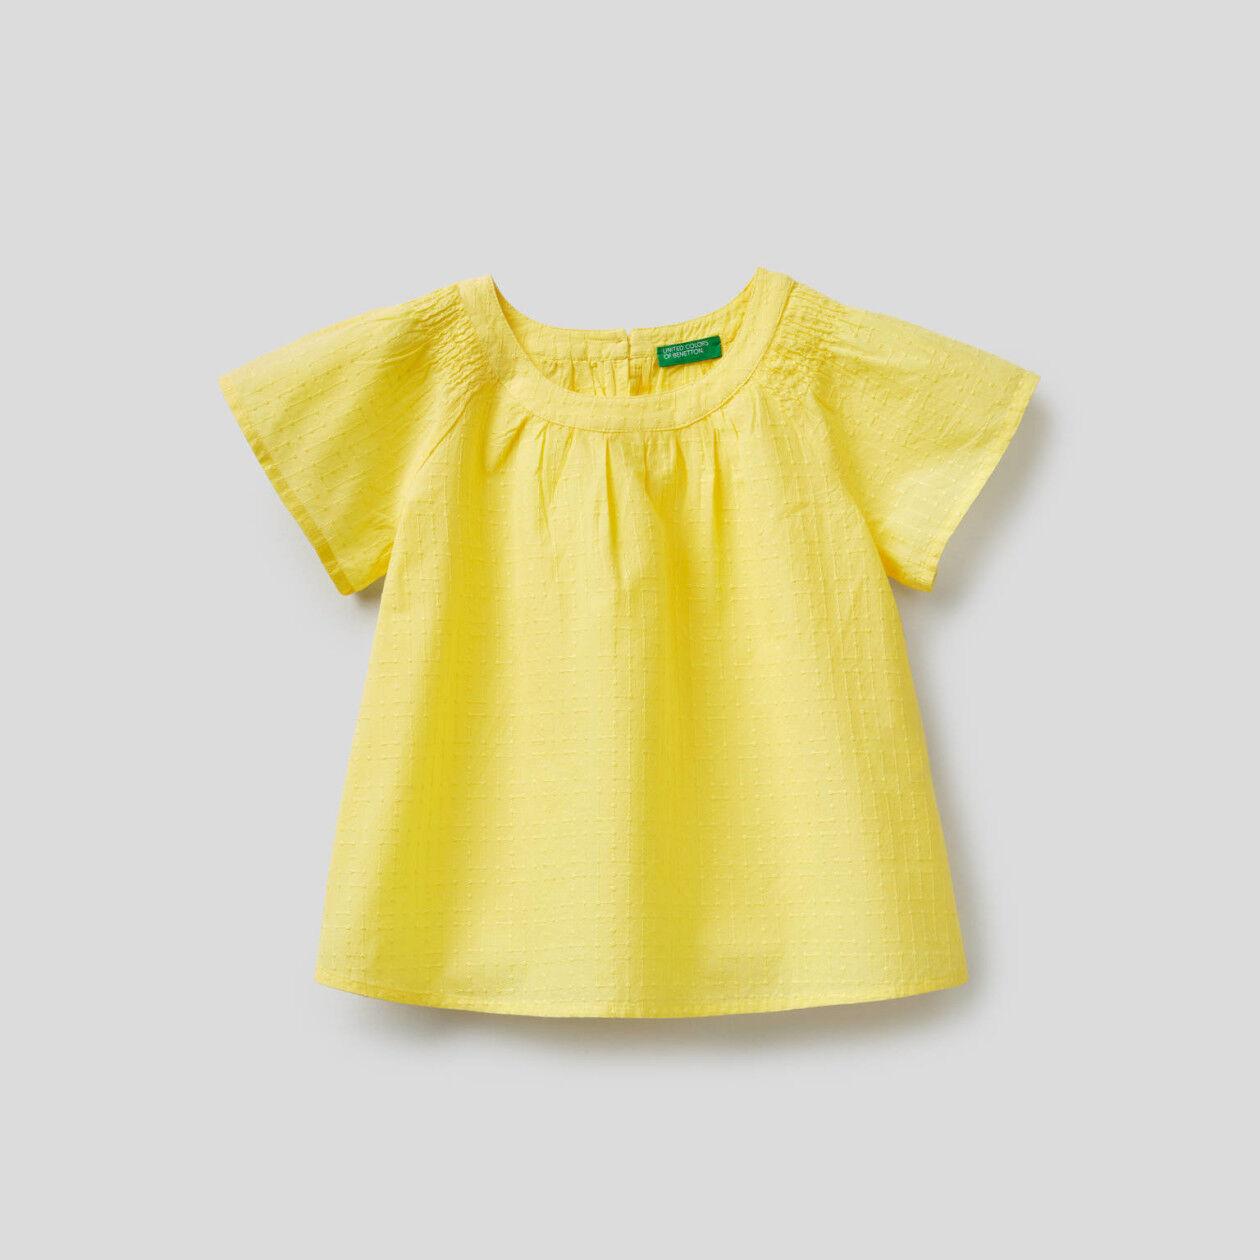 Blusa bordada de 100% algodón